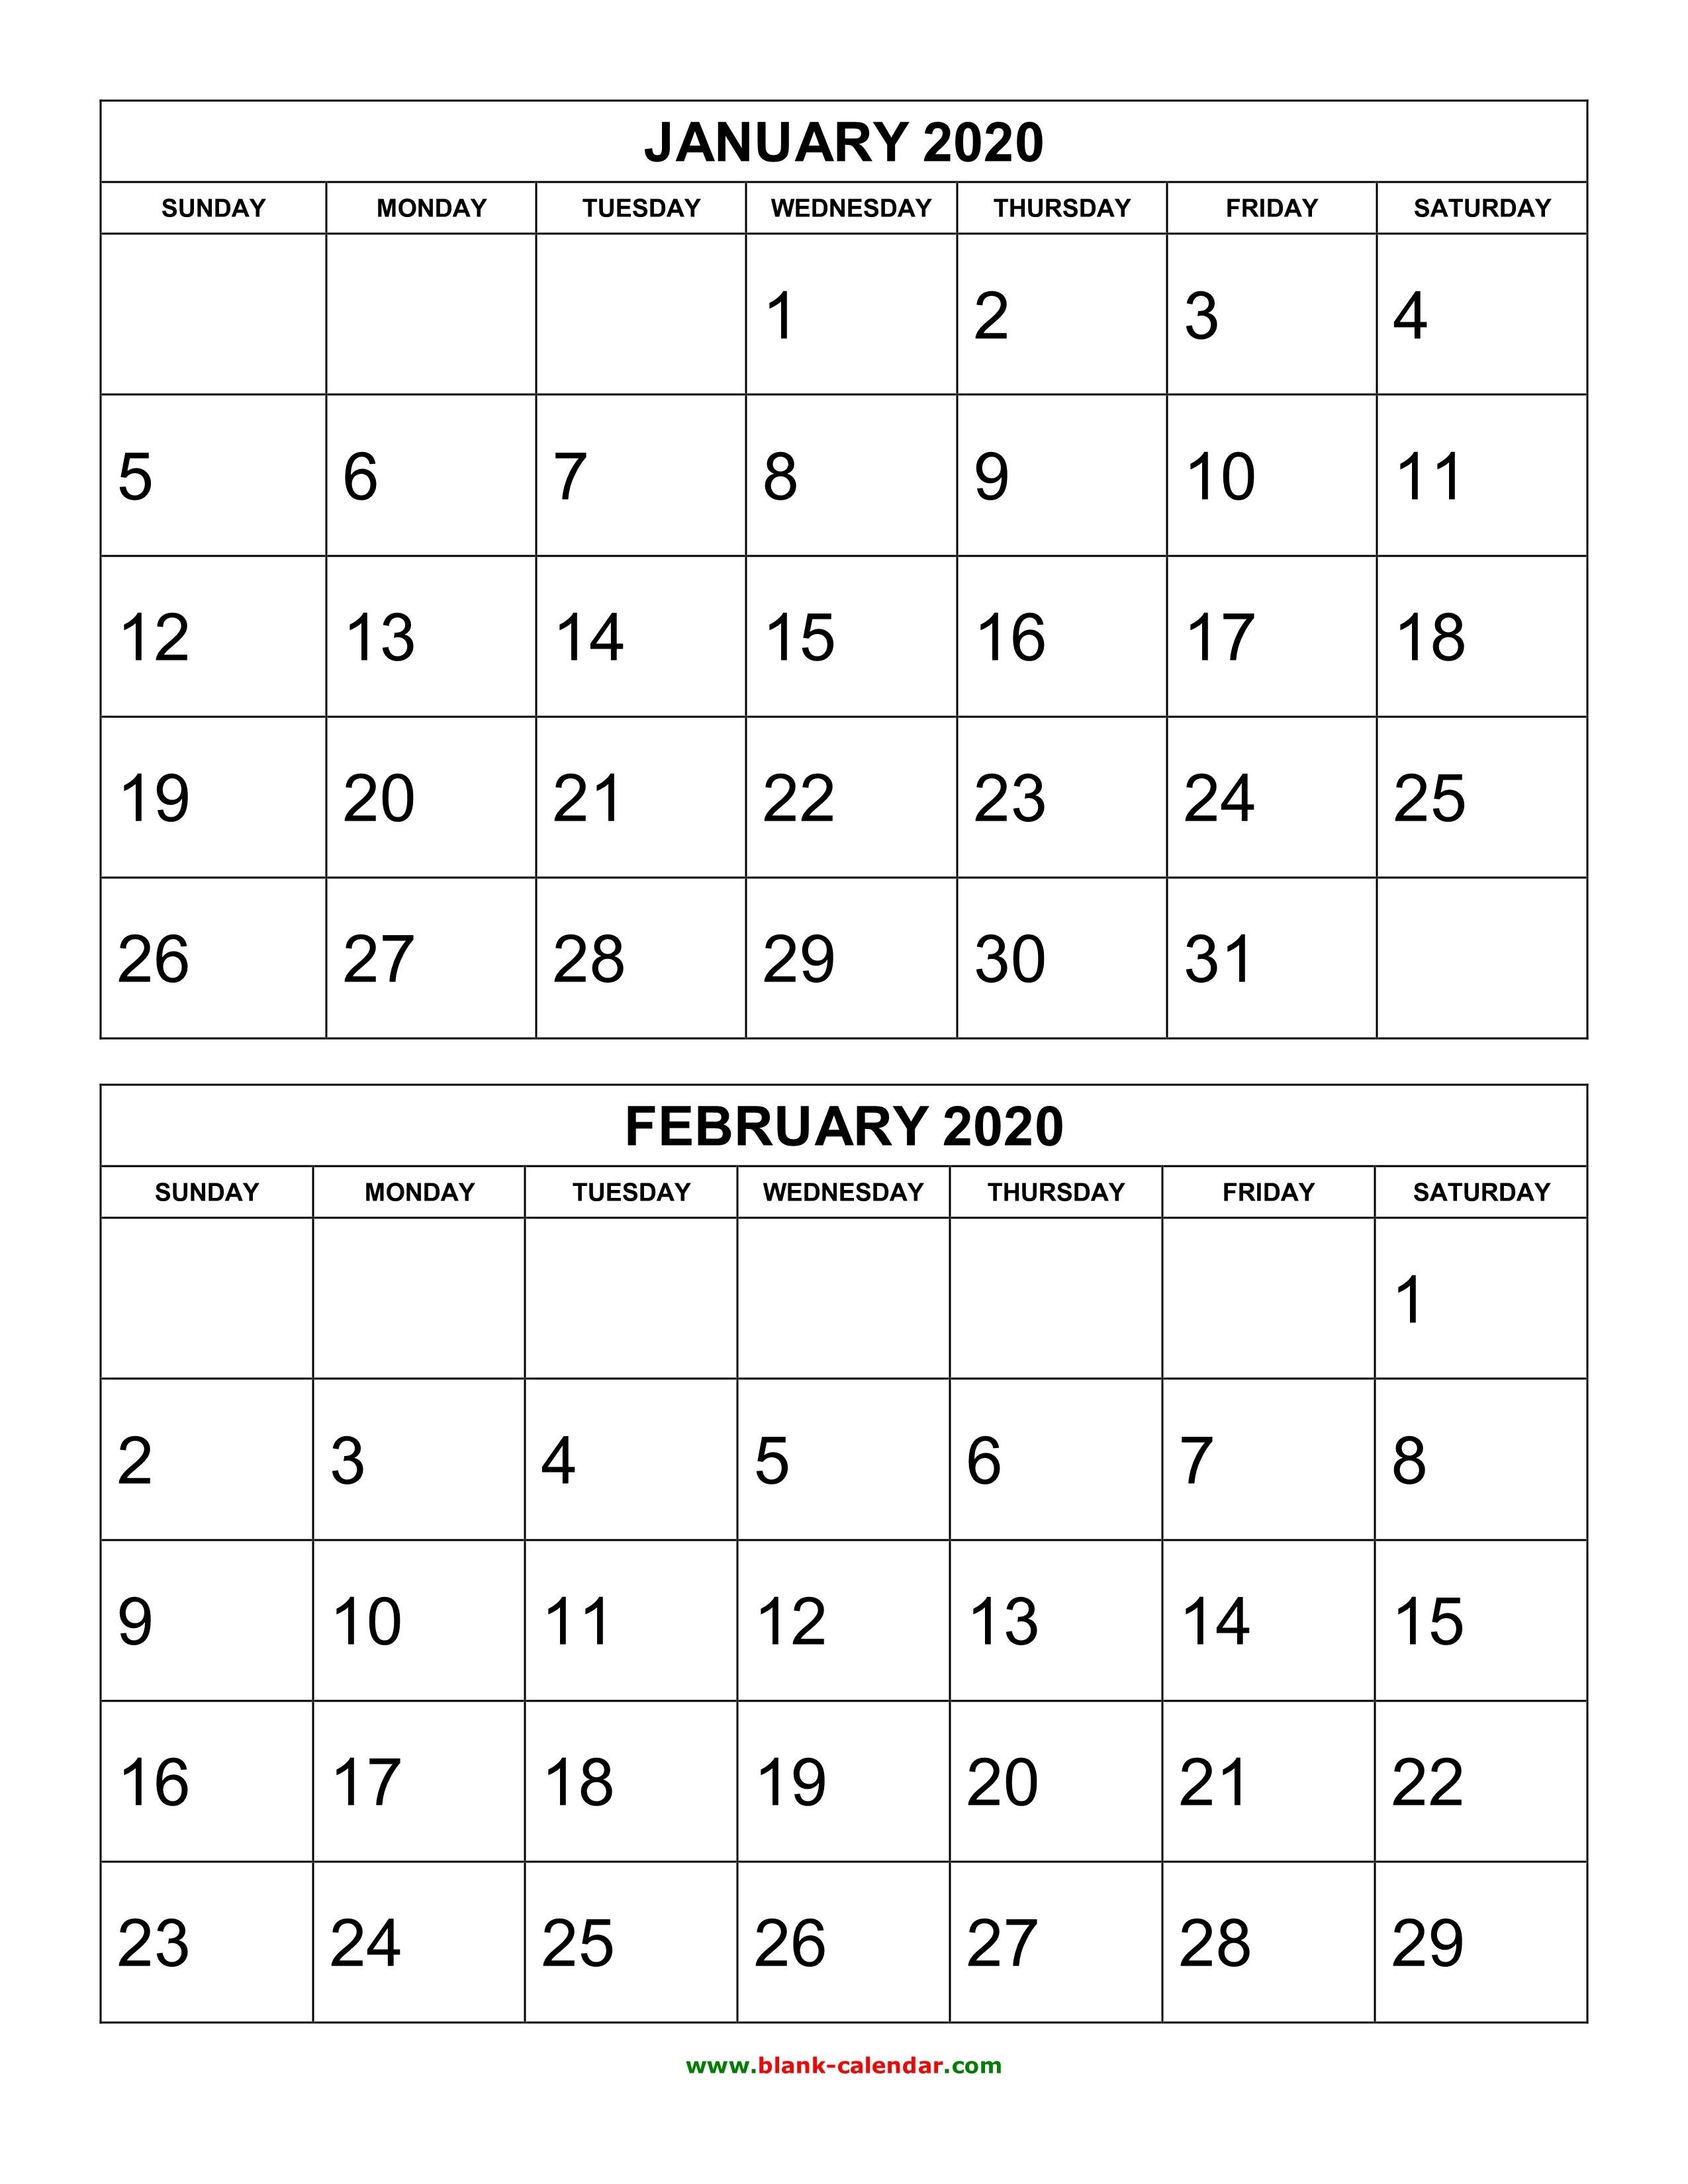 Free Download Printable Calendar 2020, 2 Months Per Page, 6-Printable Blank Calendar 2020 Two Months Per Page